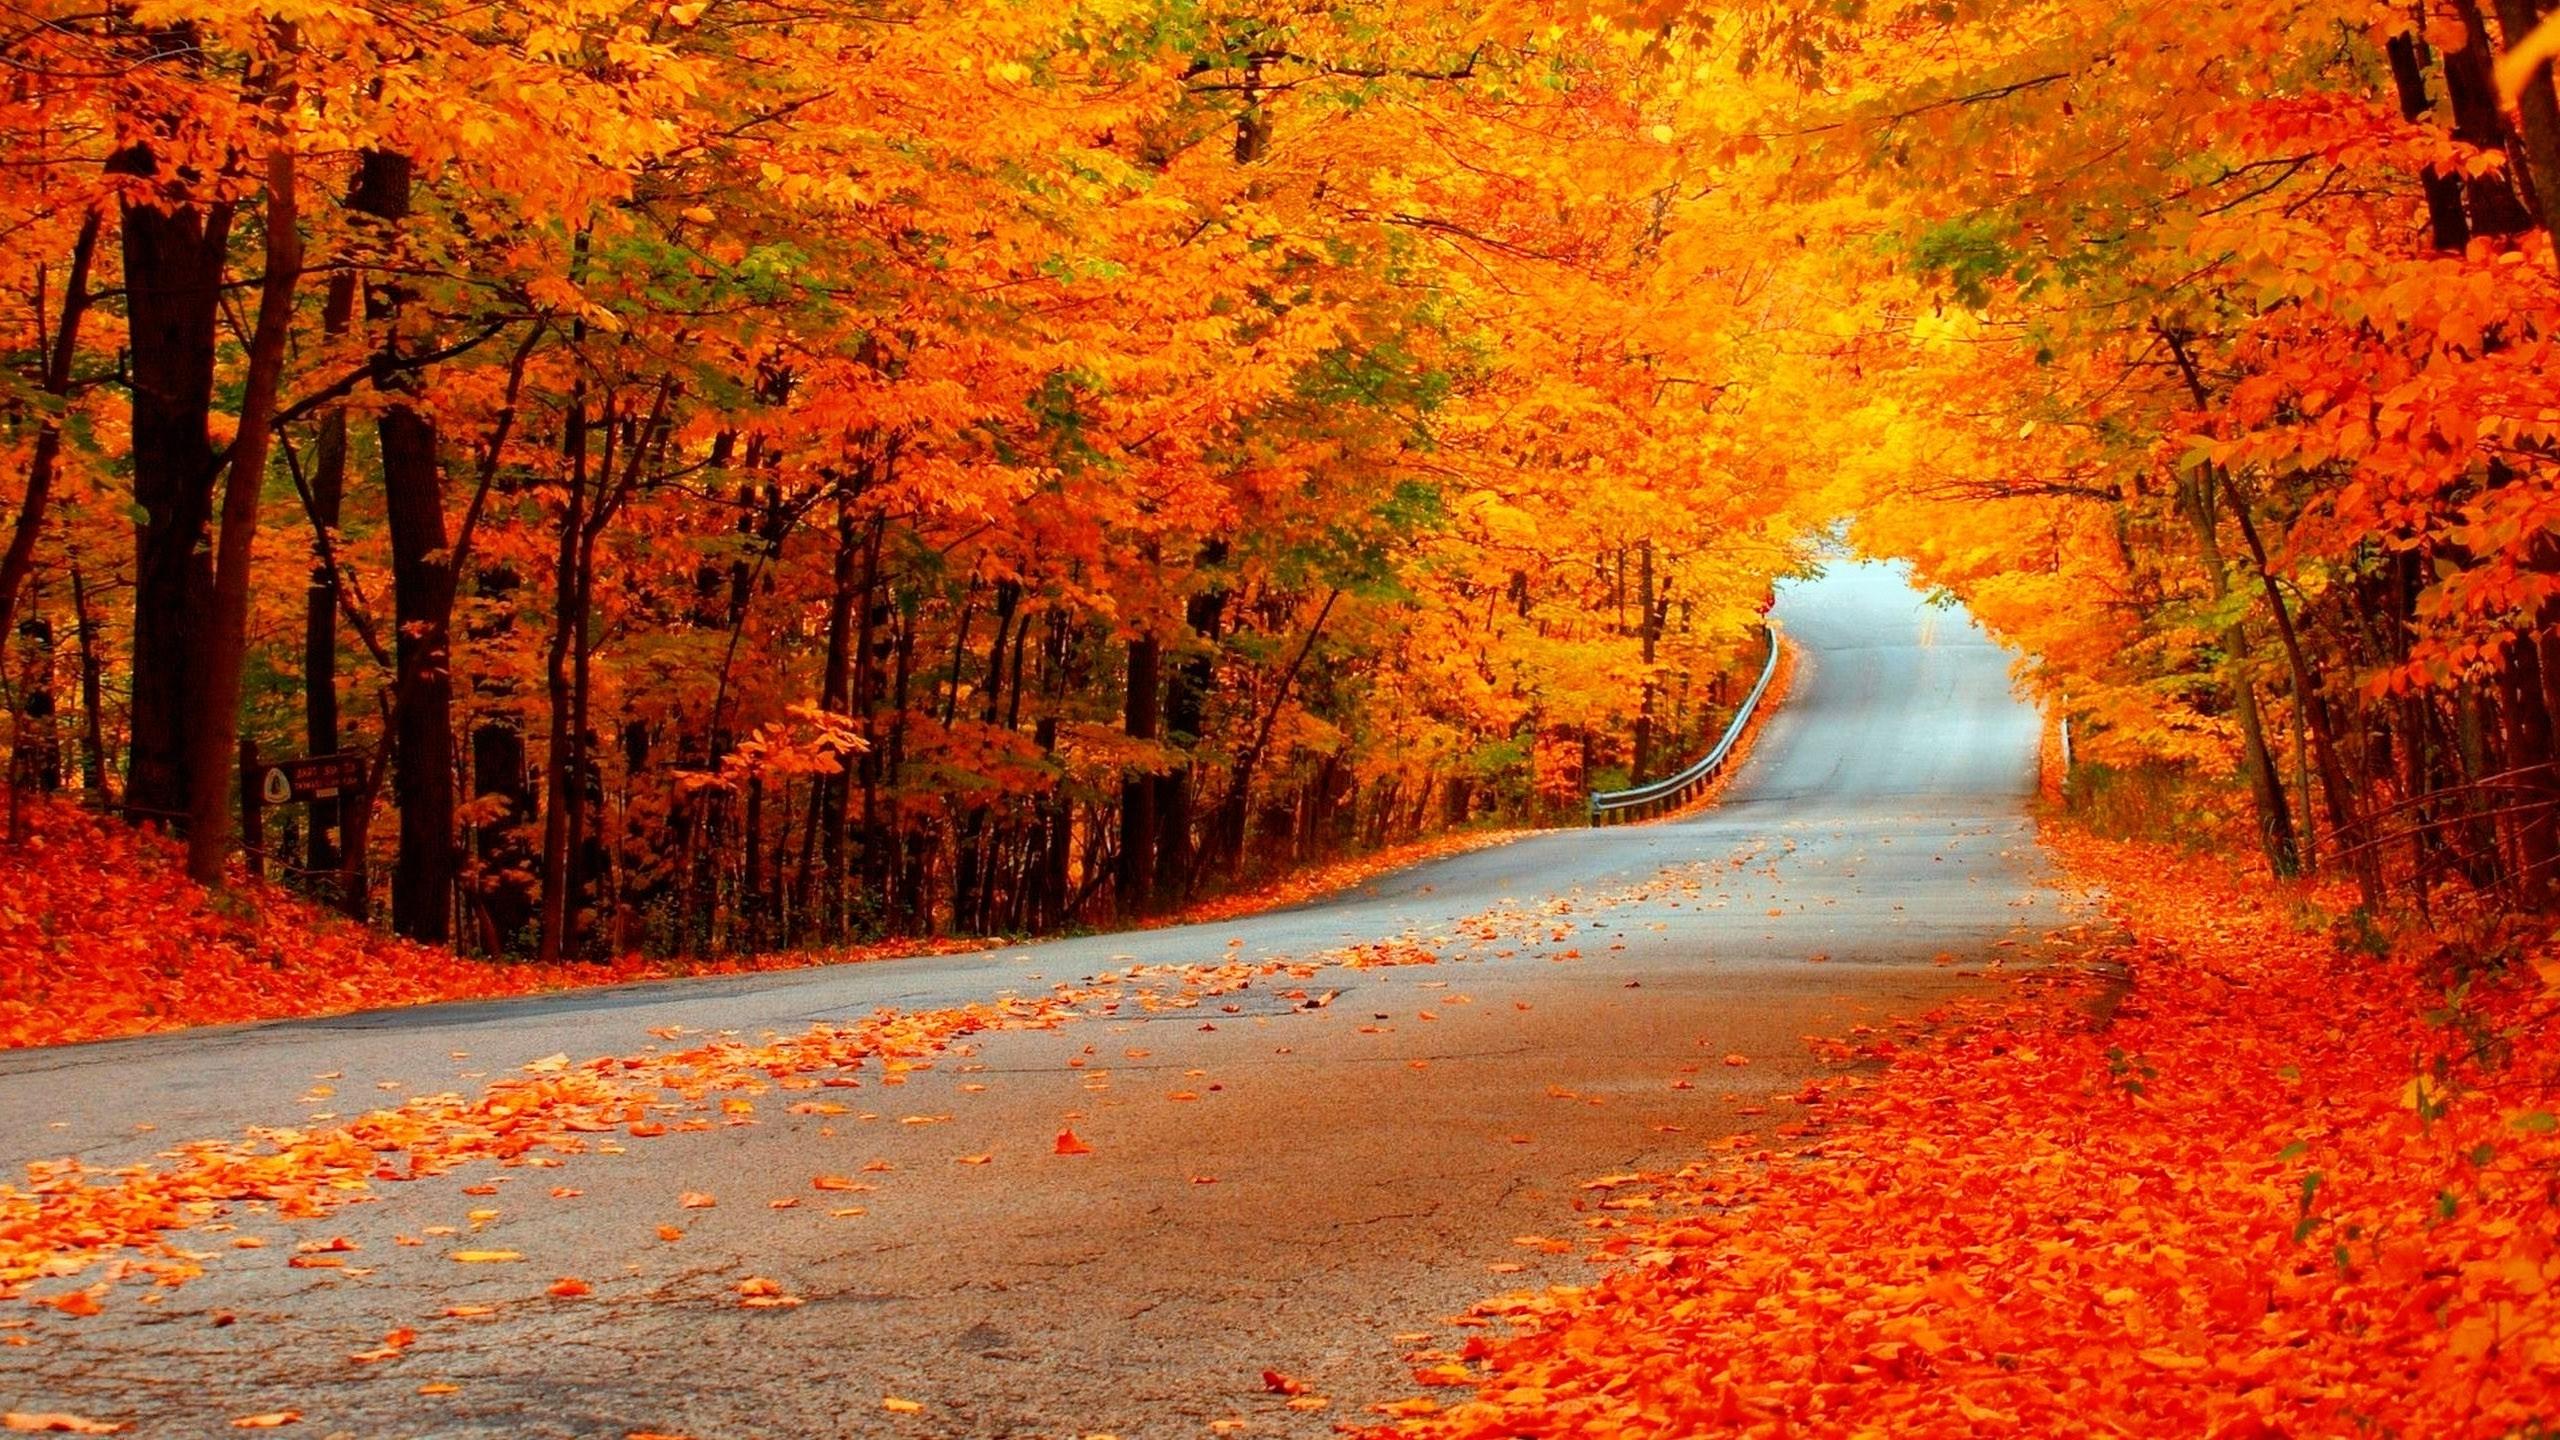 Fall wallpaper desktop